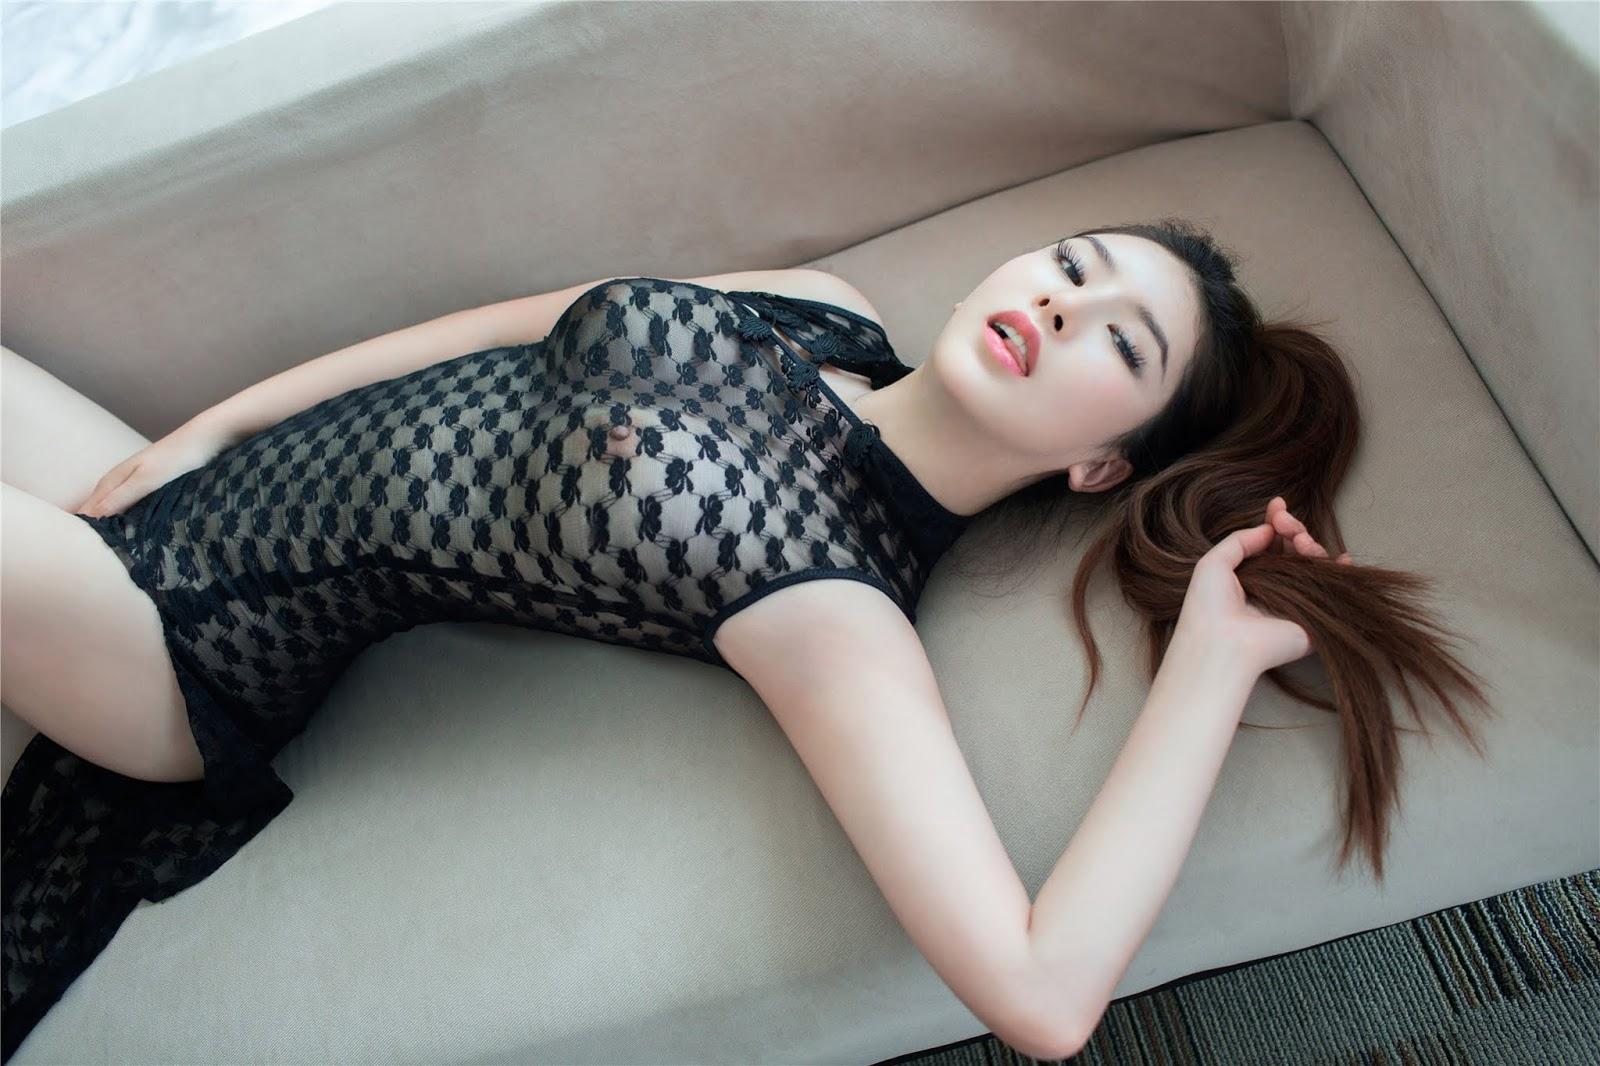 BoolWowGirls%2B%25289%2529 - Li LiSha 李丽莎 Beautiful Nude Model